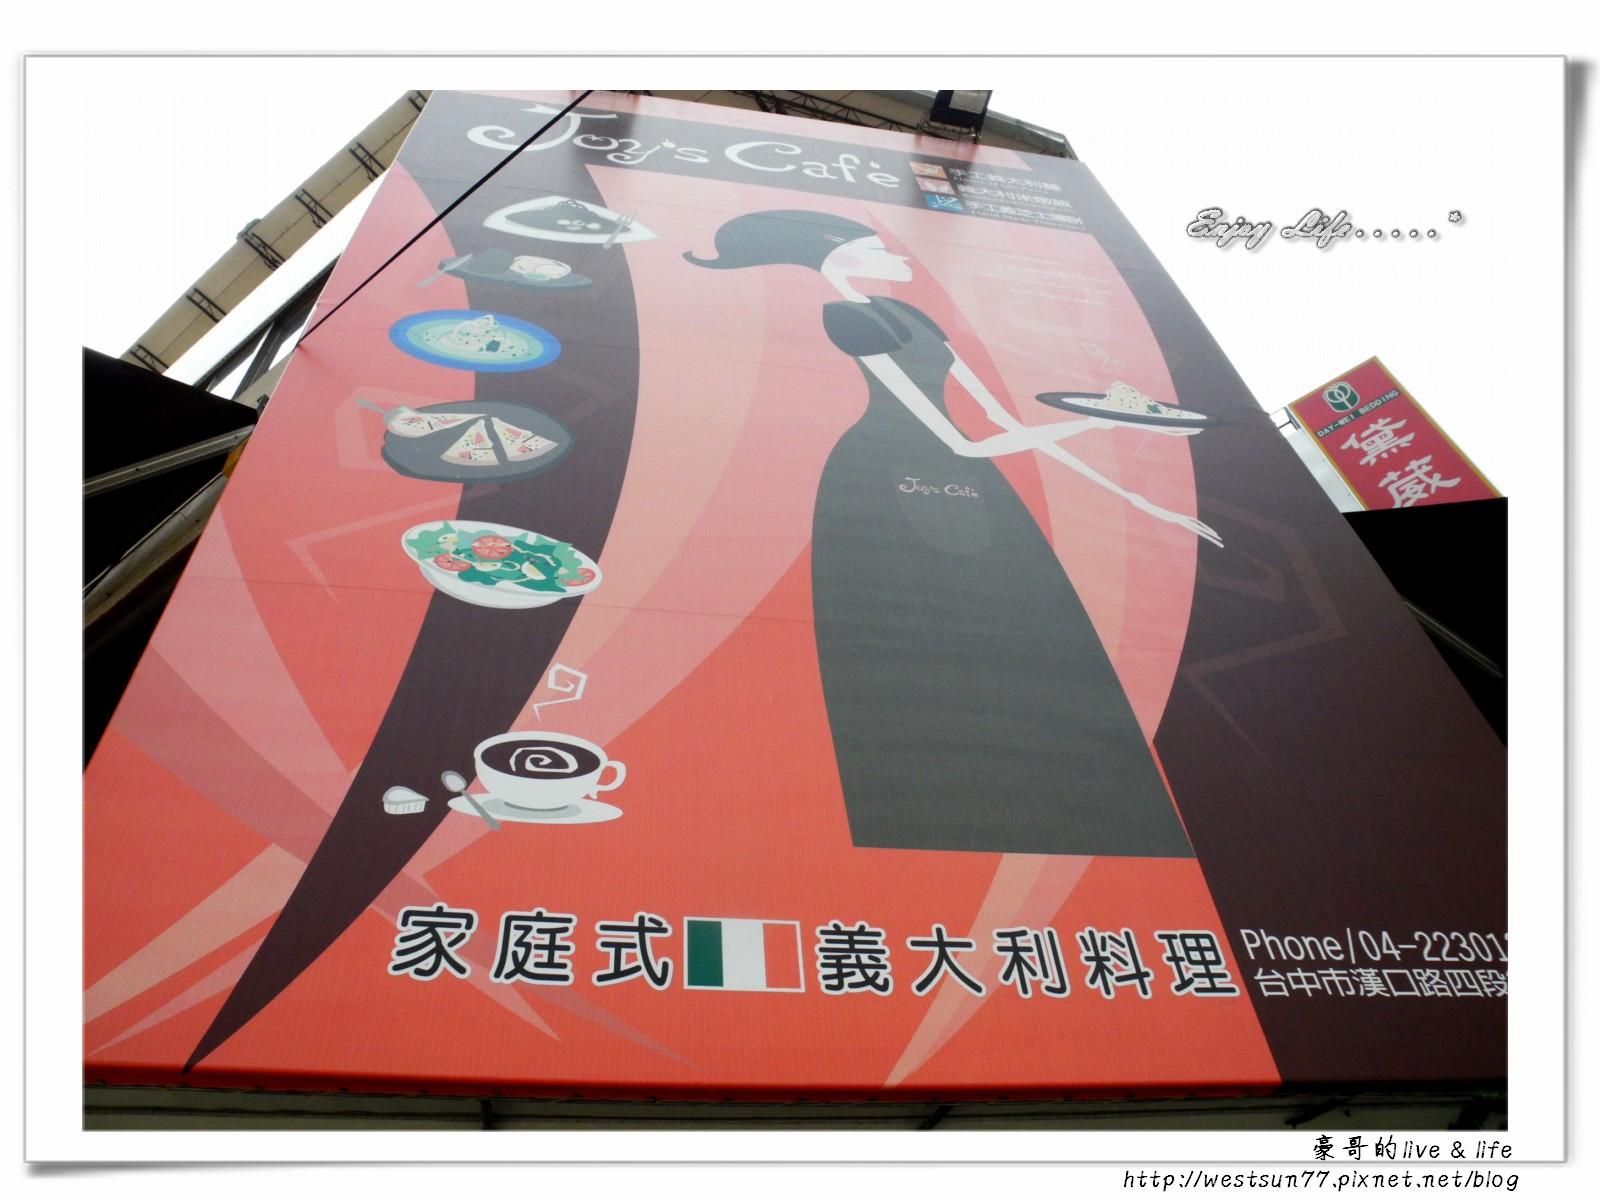 Joy's Cafe 喬帝瑭餐廳 01.jpg